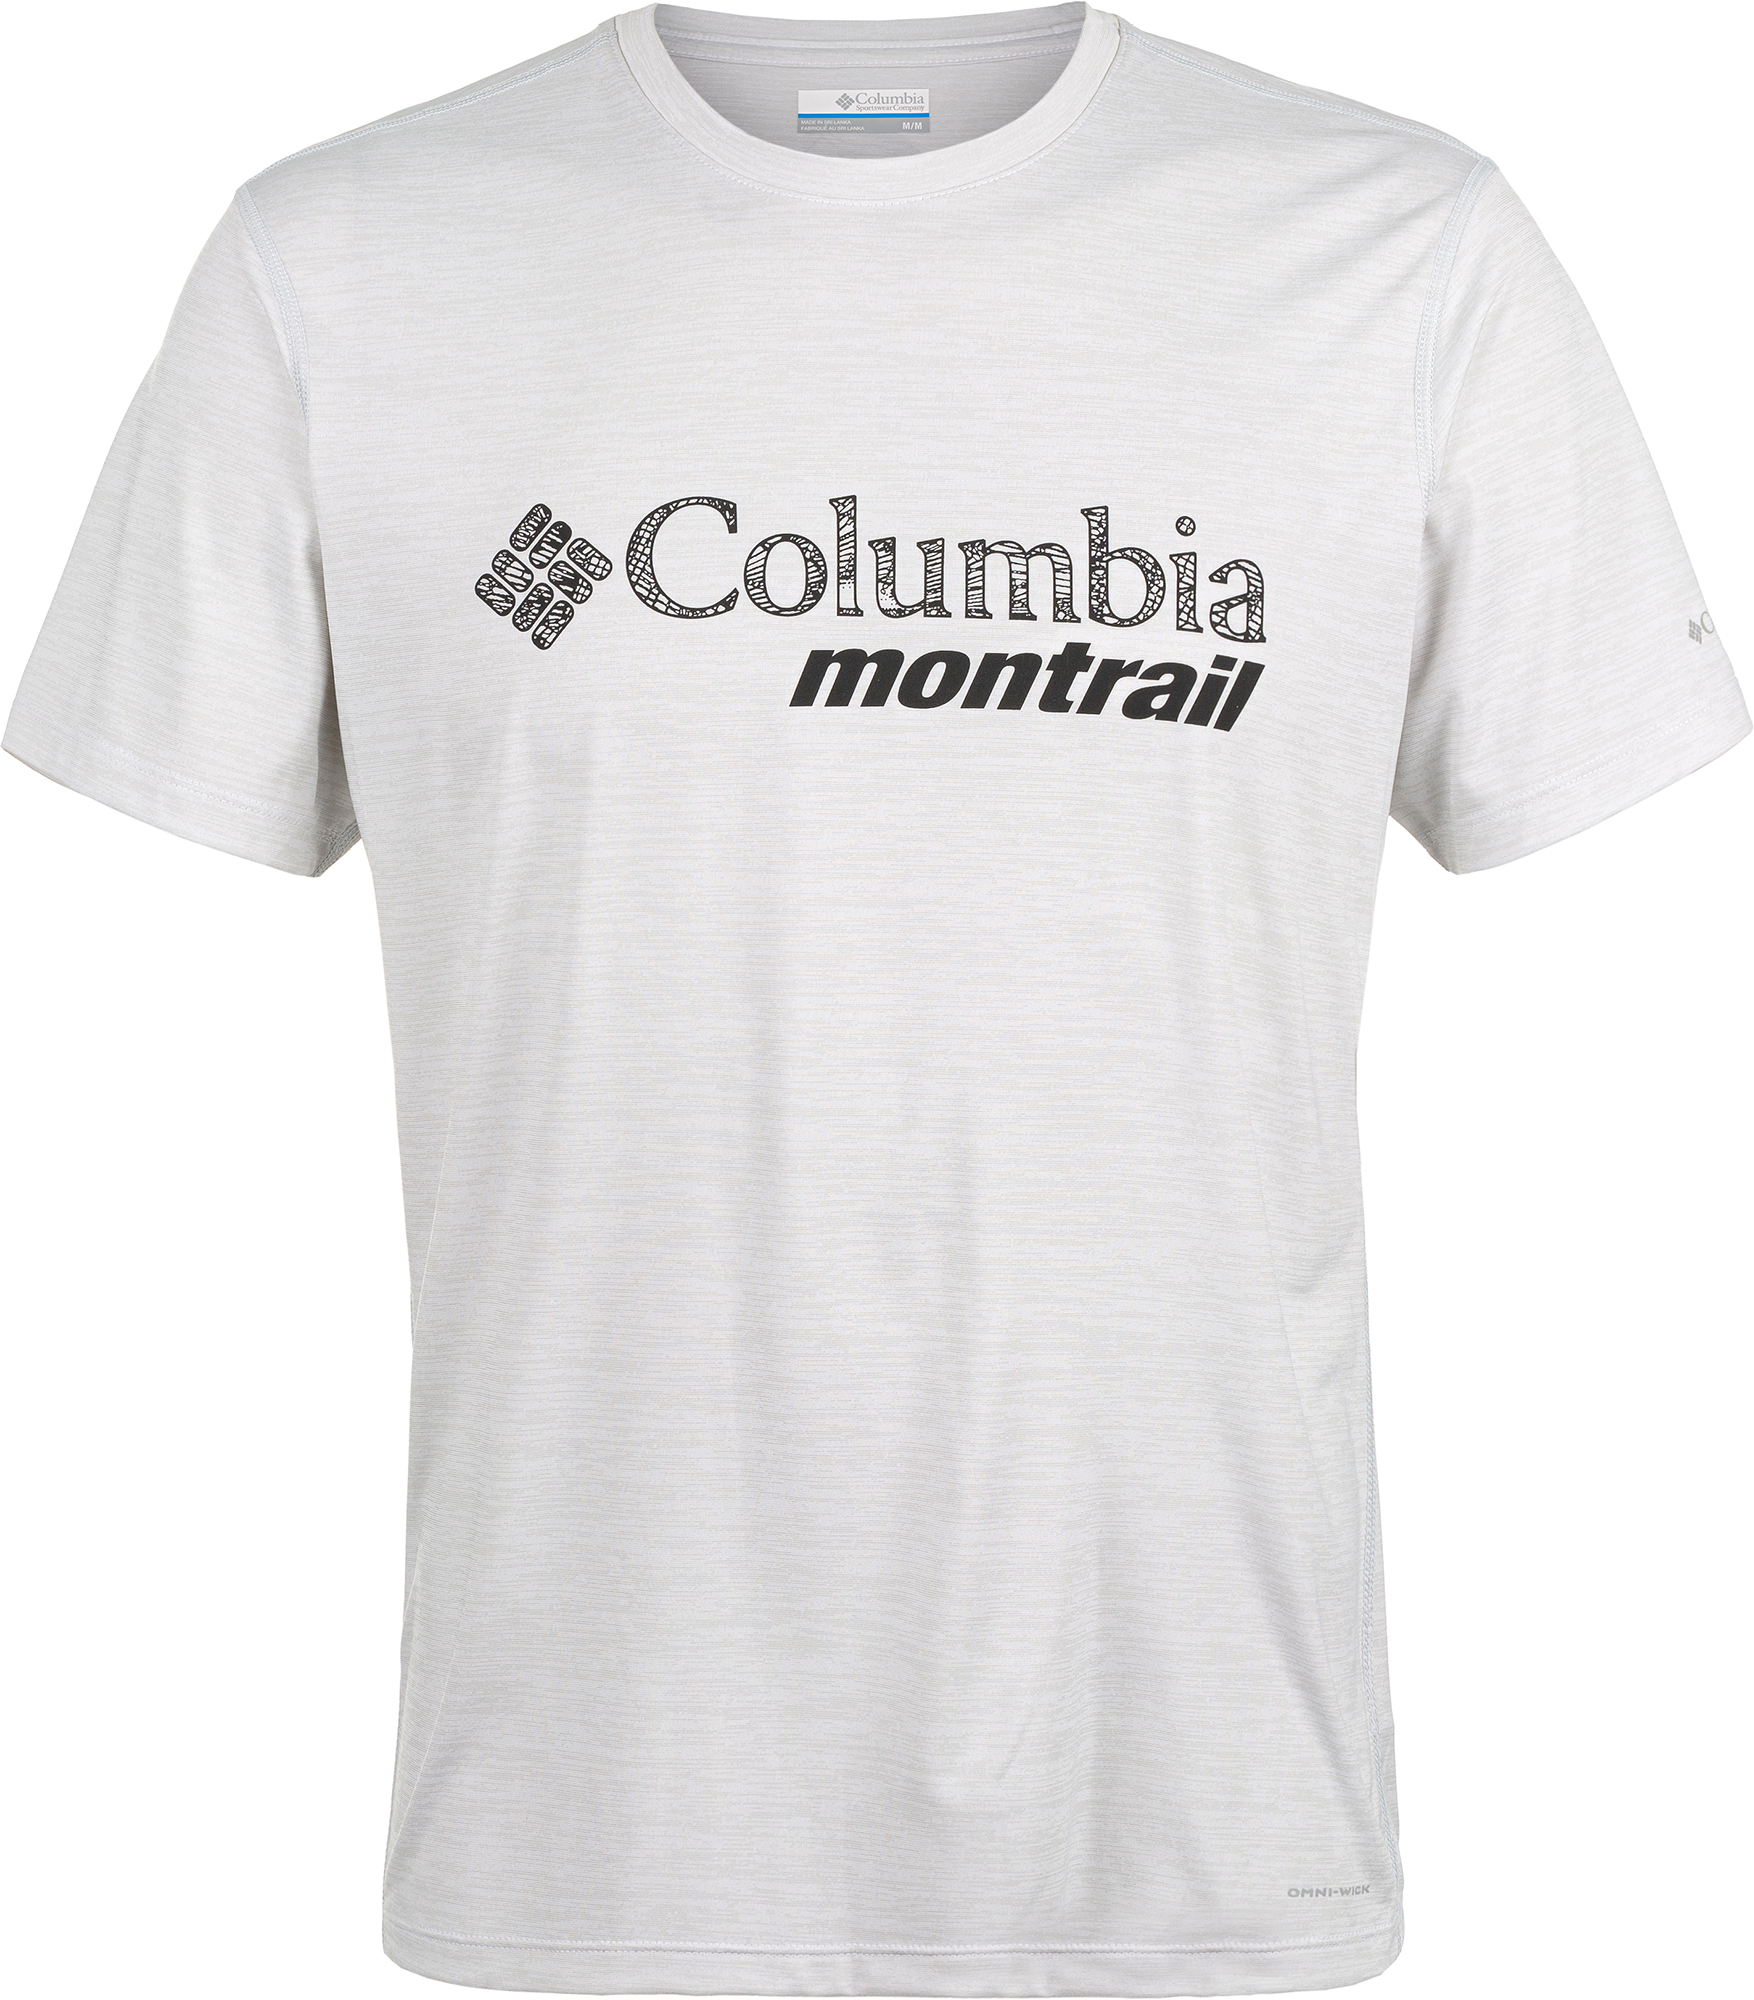 Columbia Футболка мужская Columbia Trinity Trail, размер 54 цена